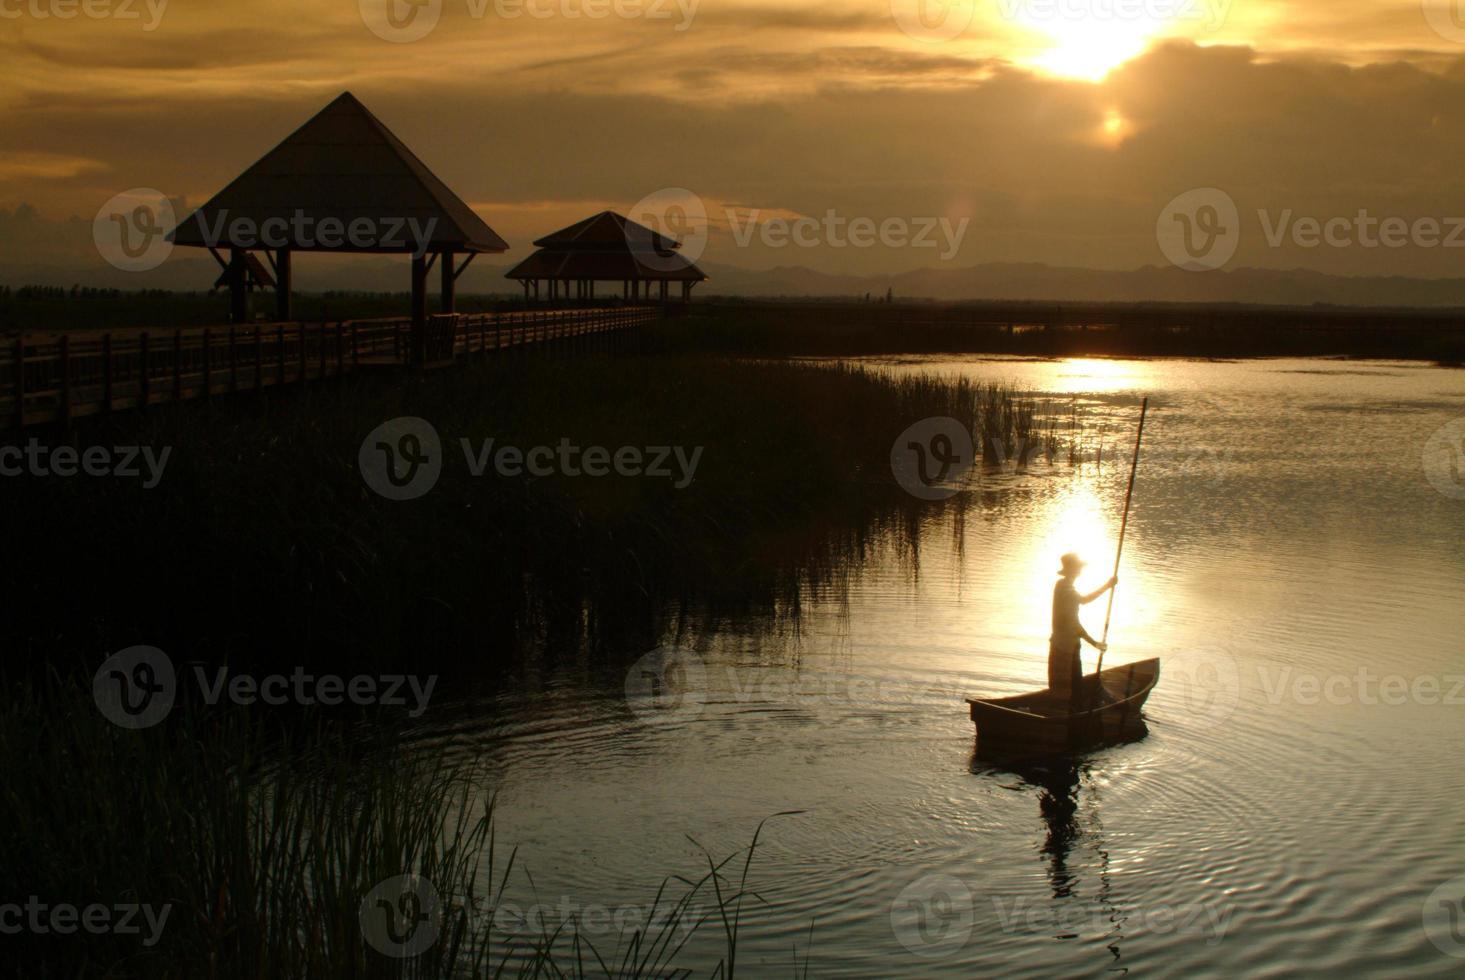 Thai villager punt on lake in Sunset . photo